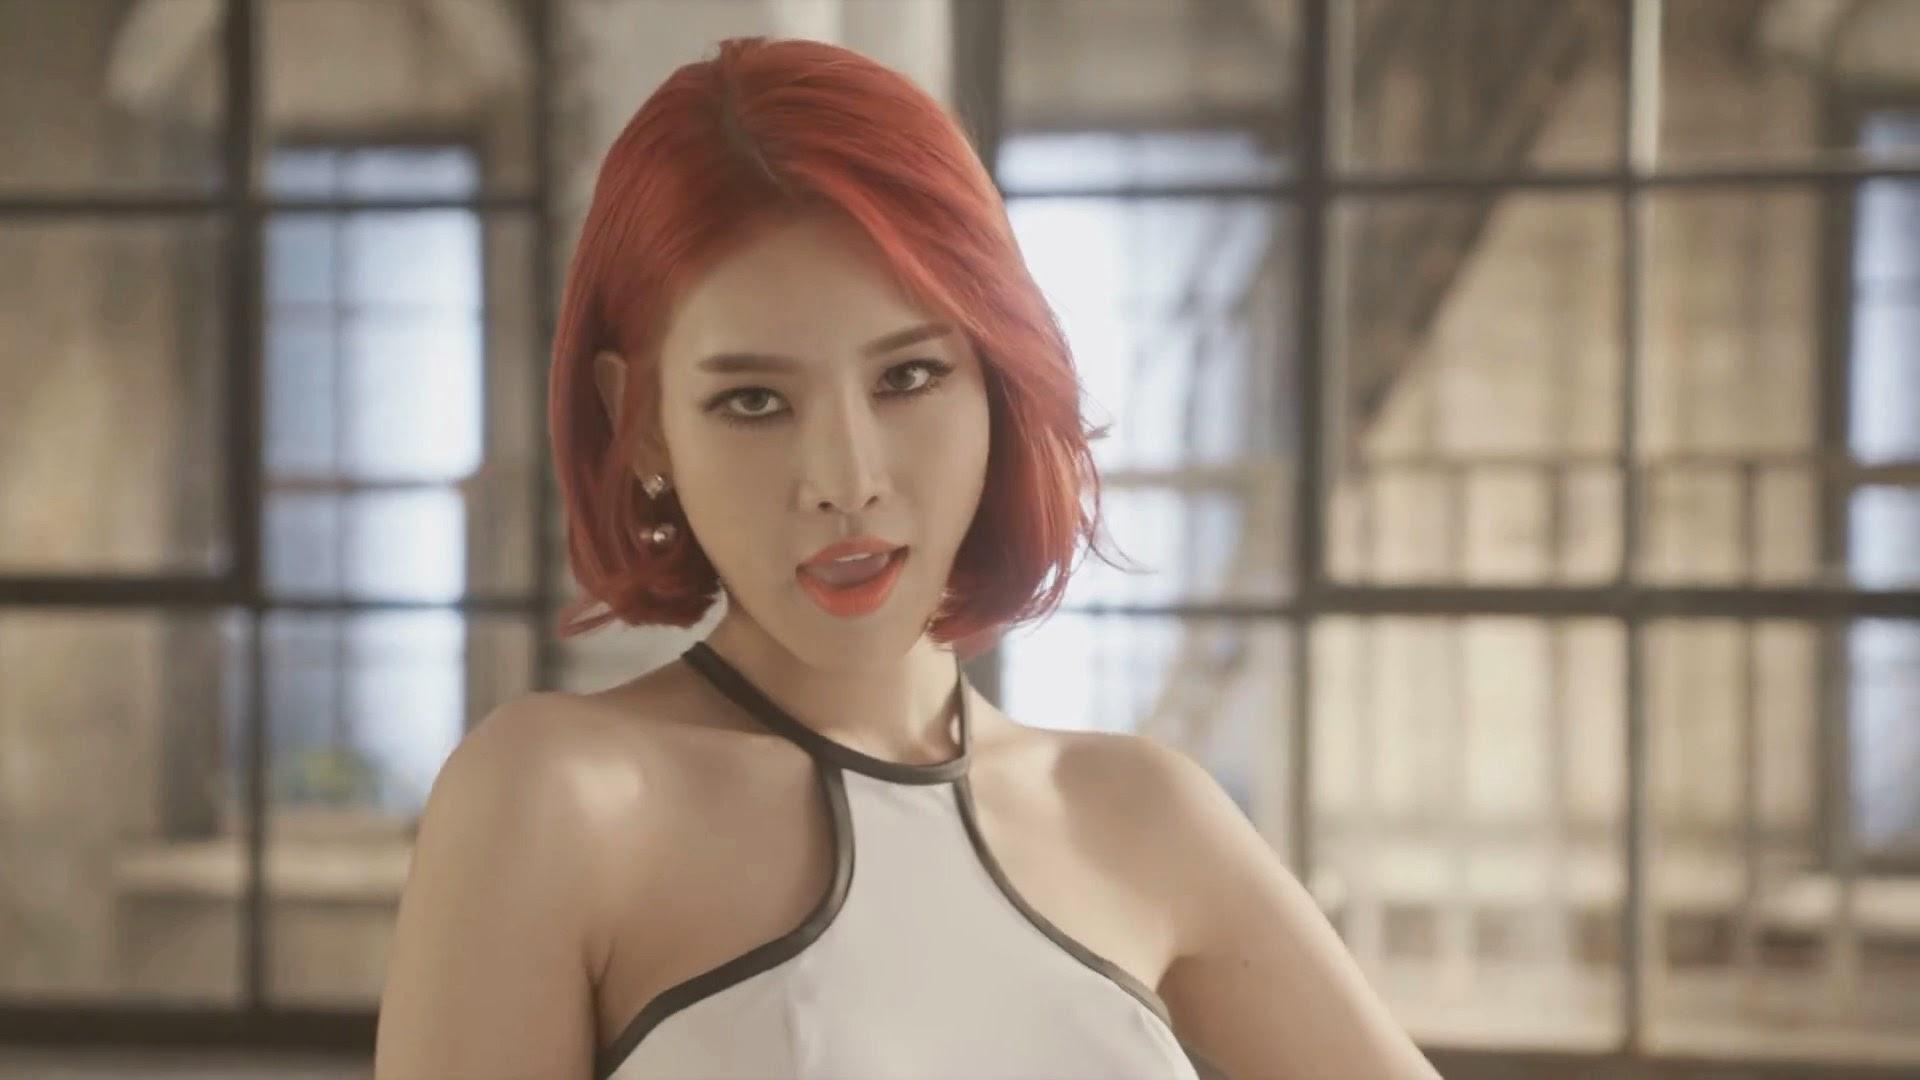 Pocket Girls' Seah in Bbang Bbang MV